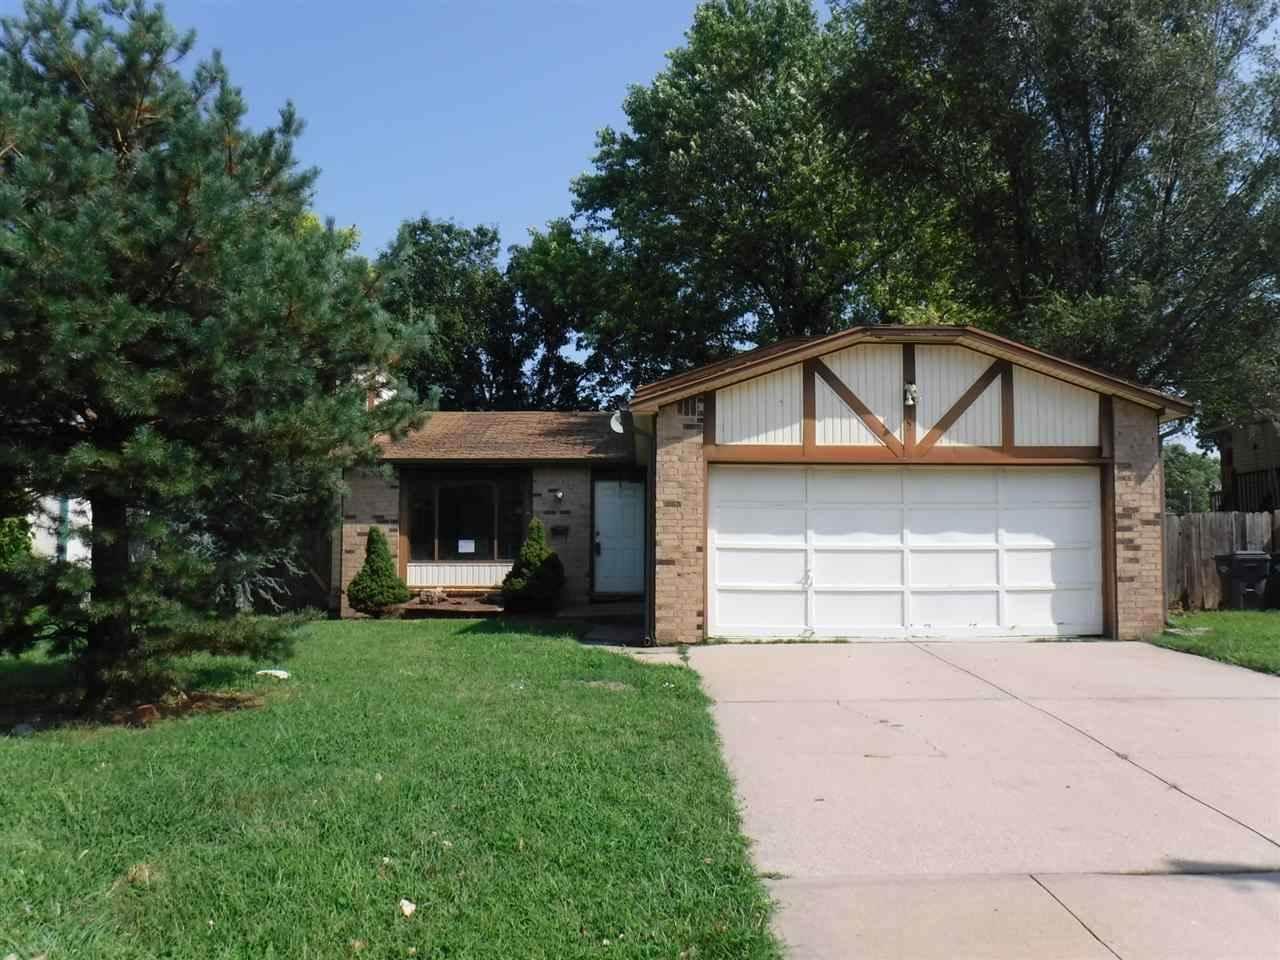 2520 W Sunnybrook St, Wichita, KS 67217